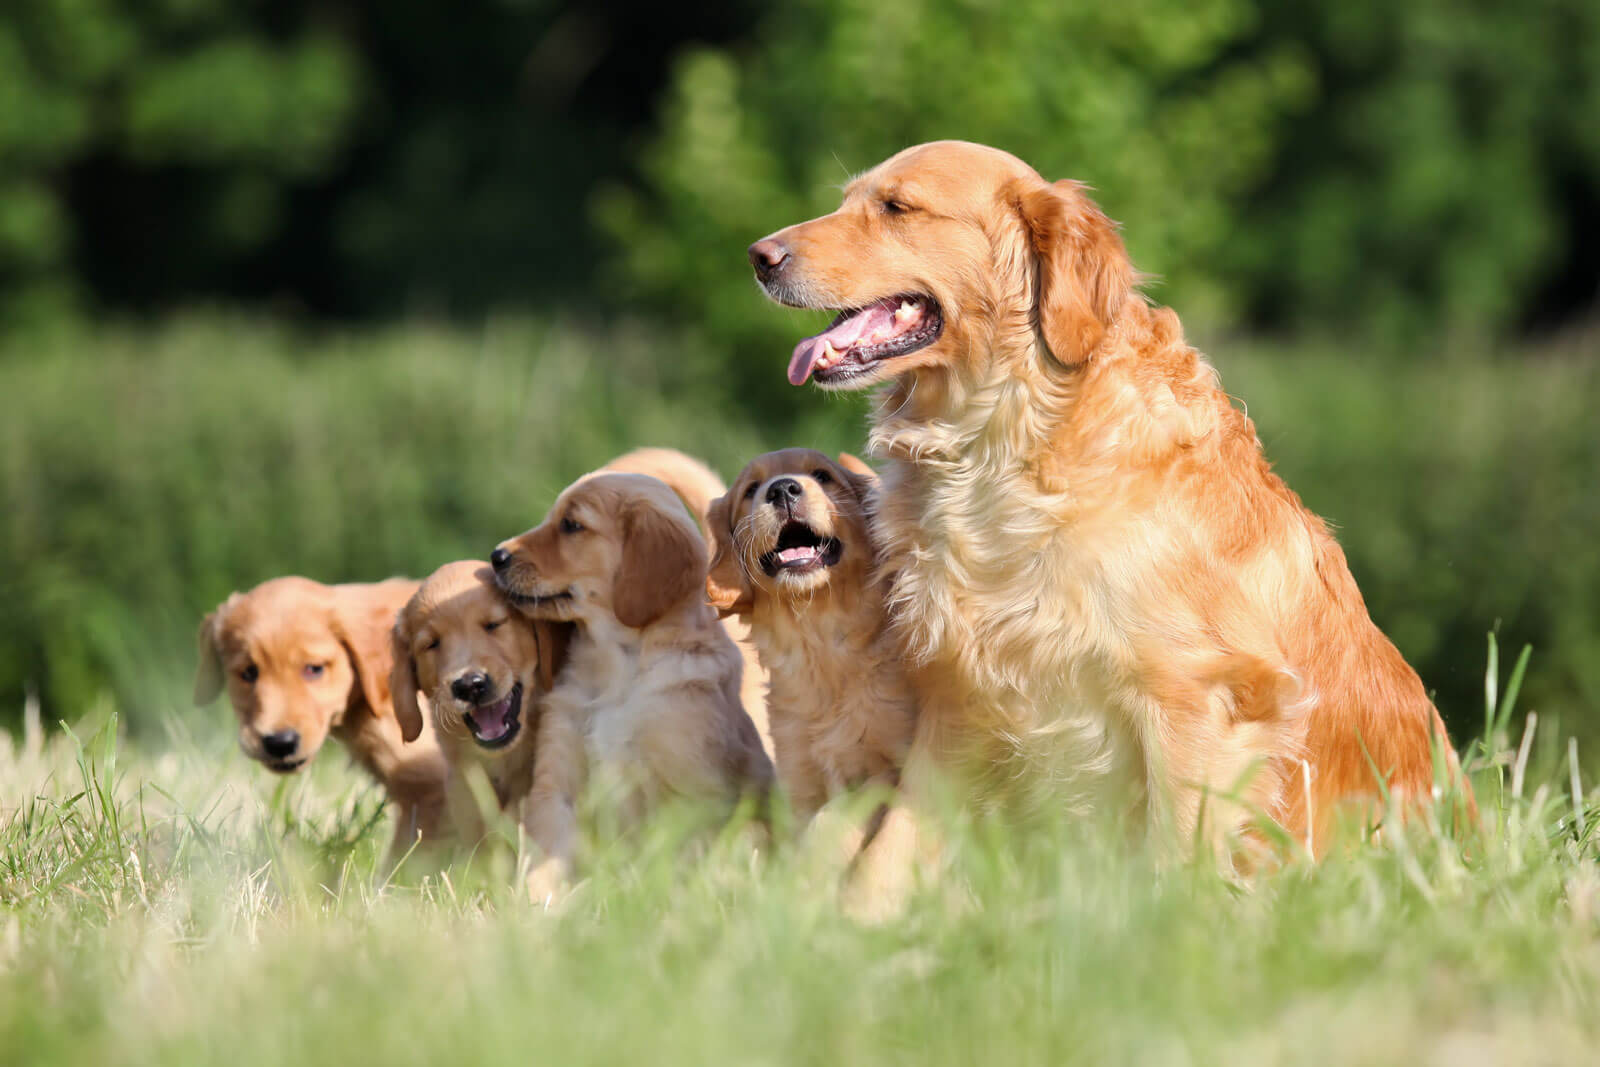 Anjing Golden : Karakter, Variasi Jenis, kelebihan & Harga (Update) 7